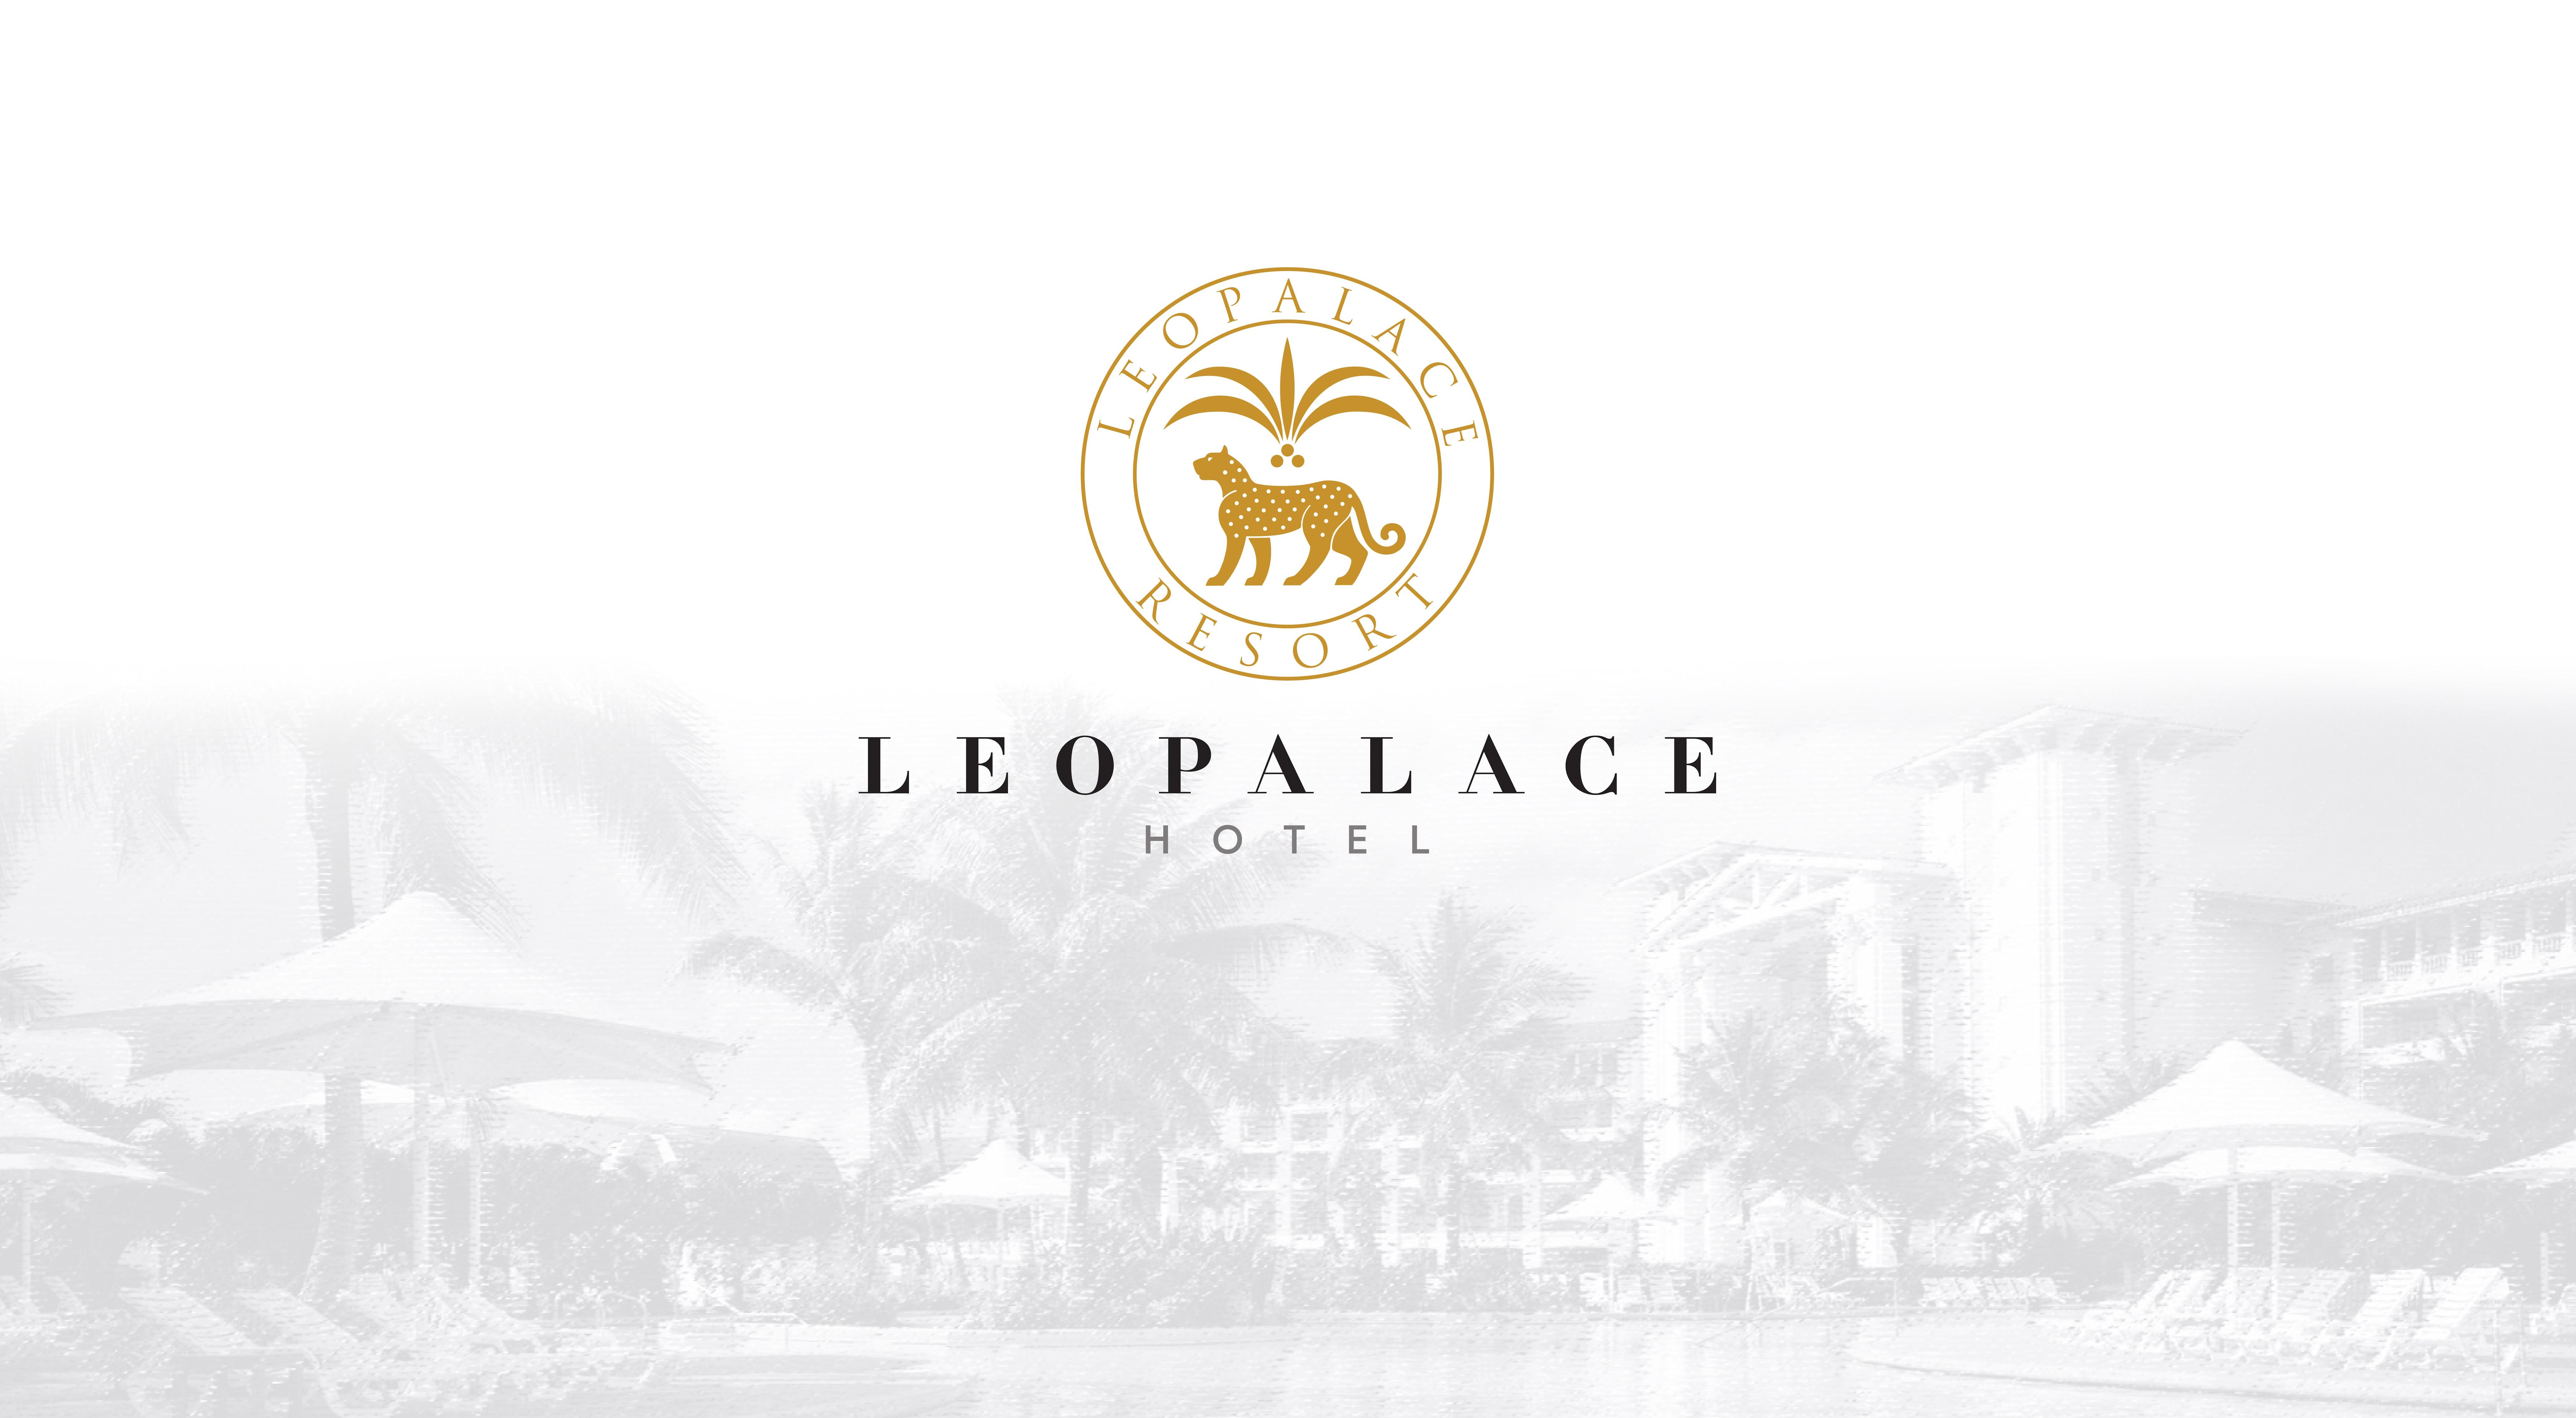 Leo palace branding design 2